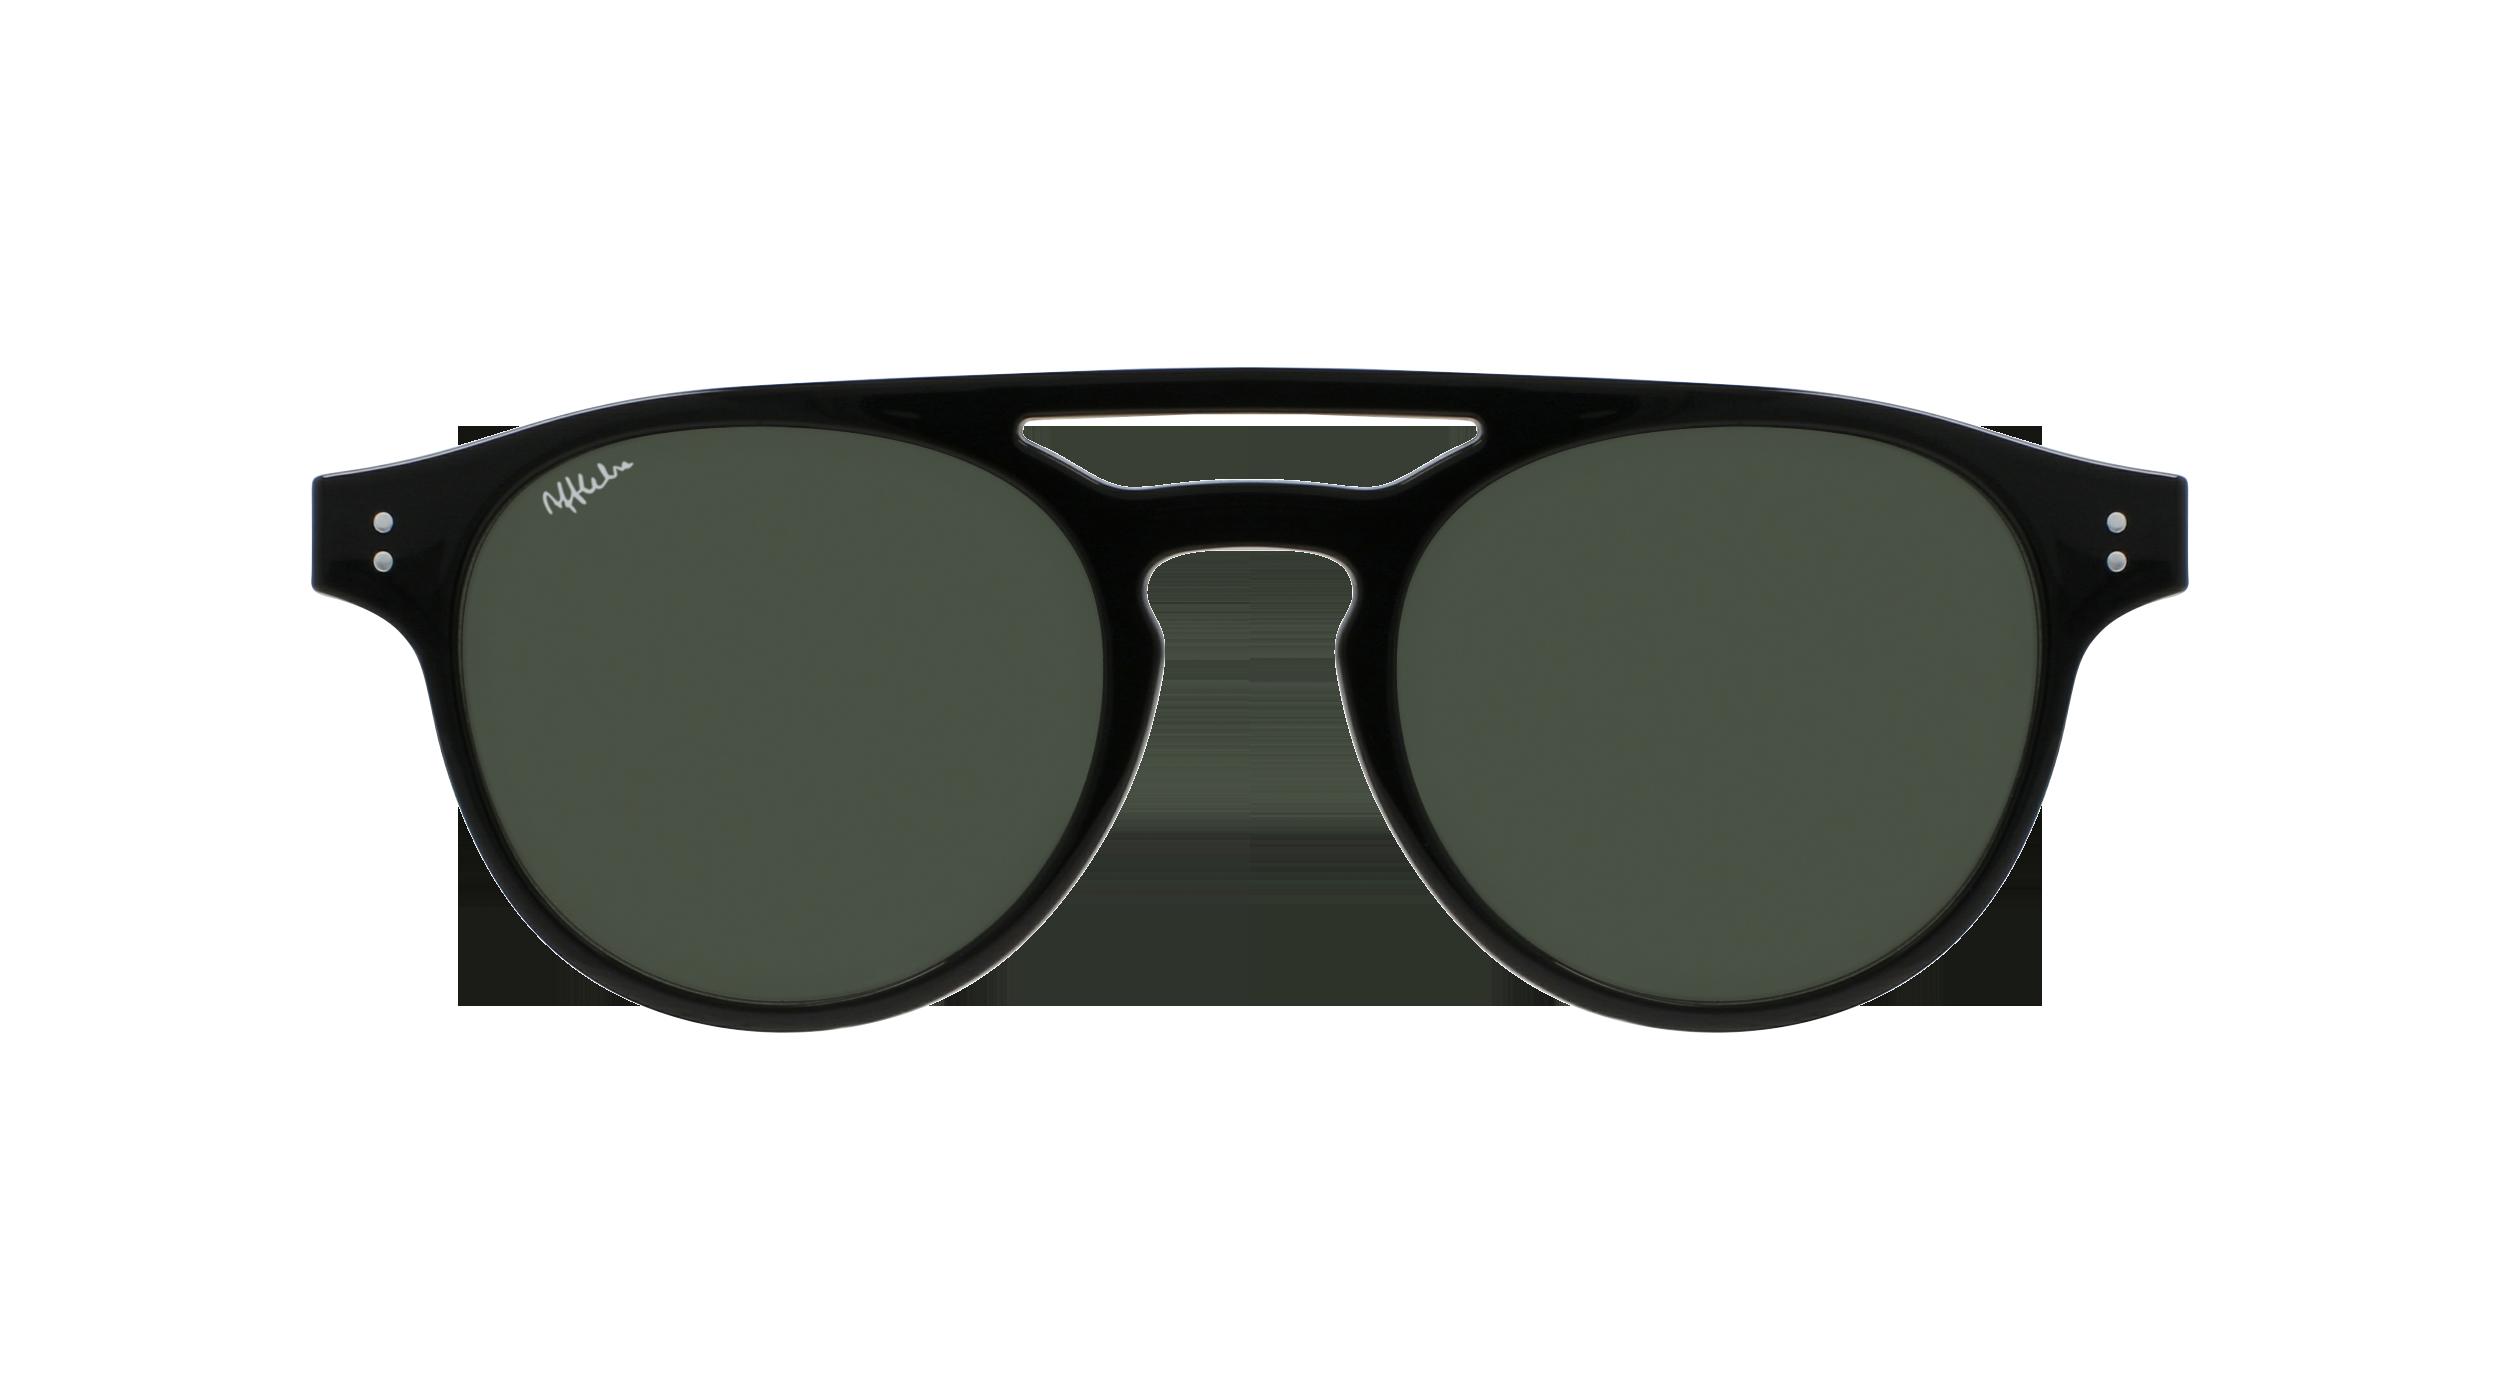 afflelou/france/products/smart_clip/clips_glasses/07630036436172.png